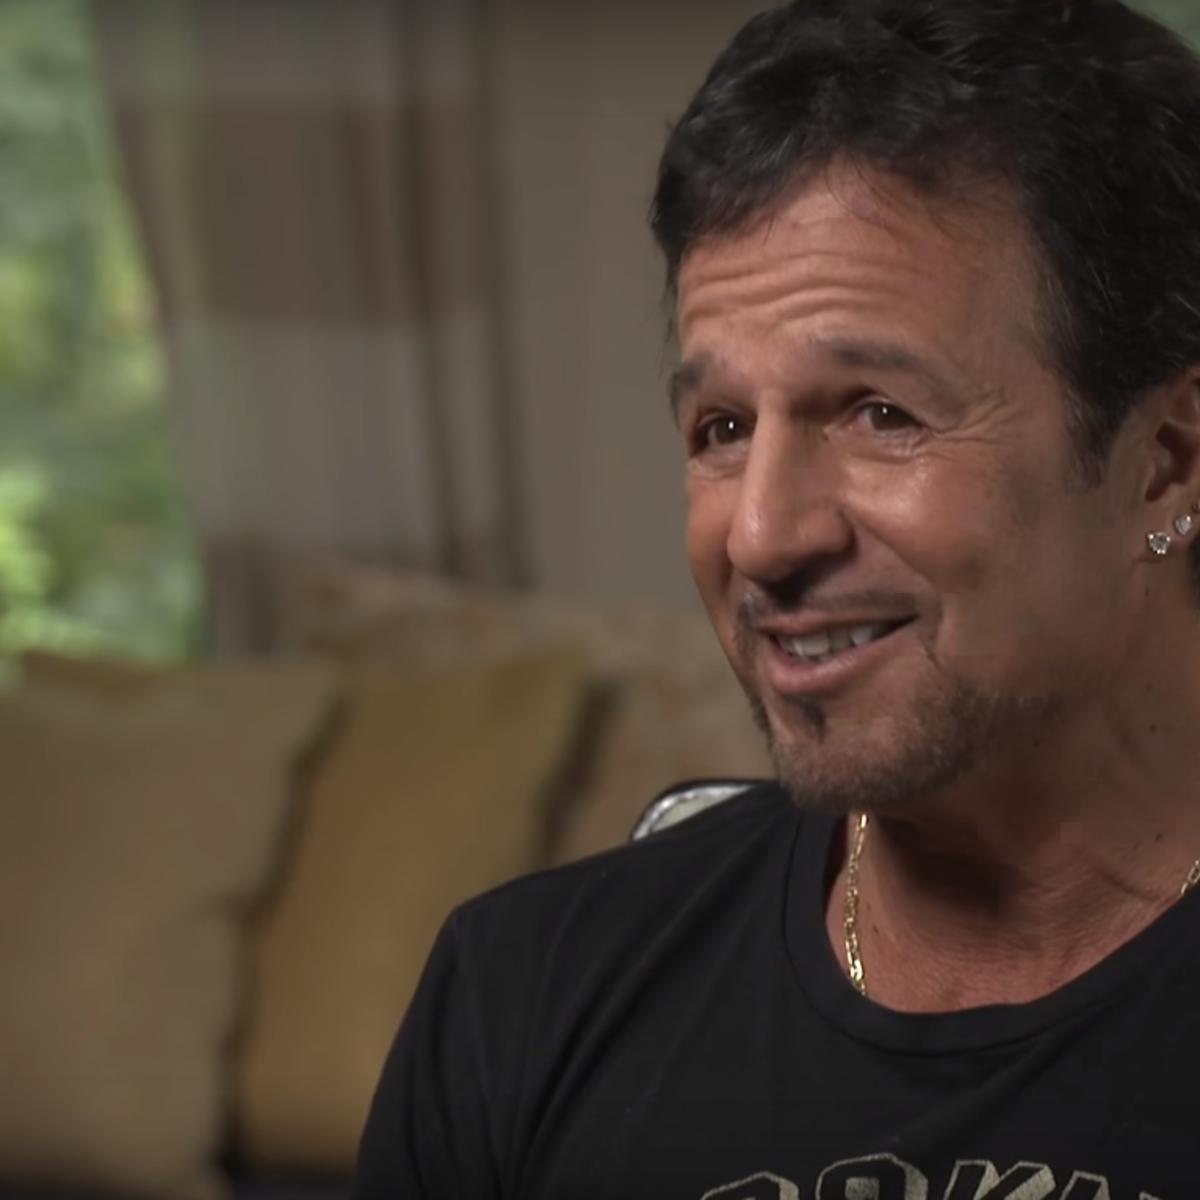 john-romita-jr-interview-syfywire-screengrab.png